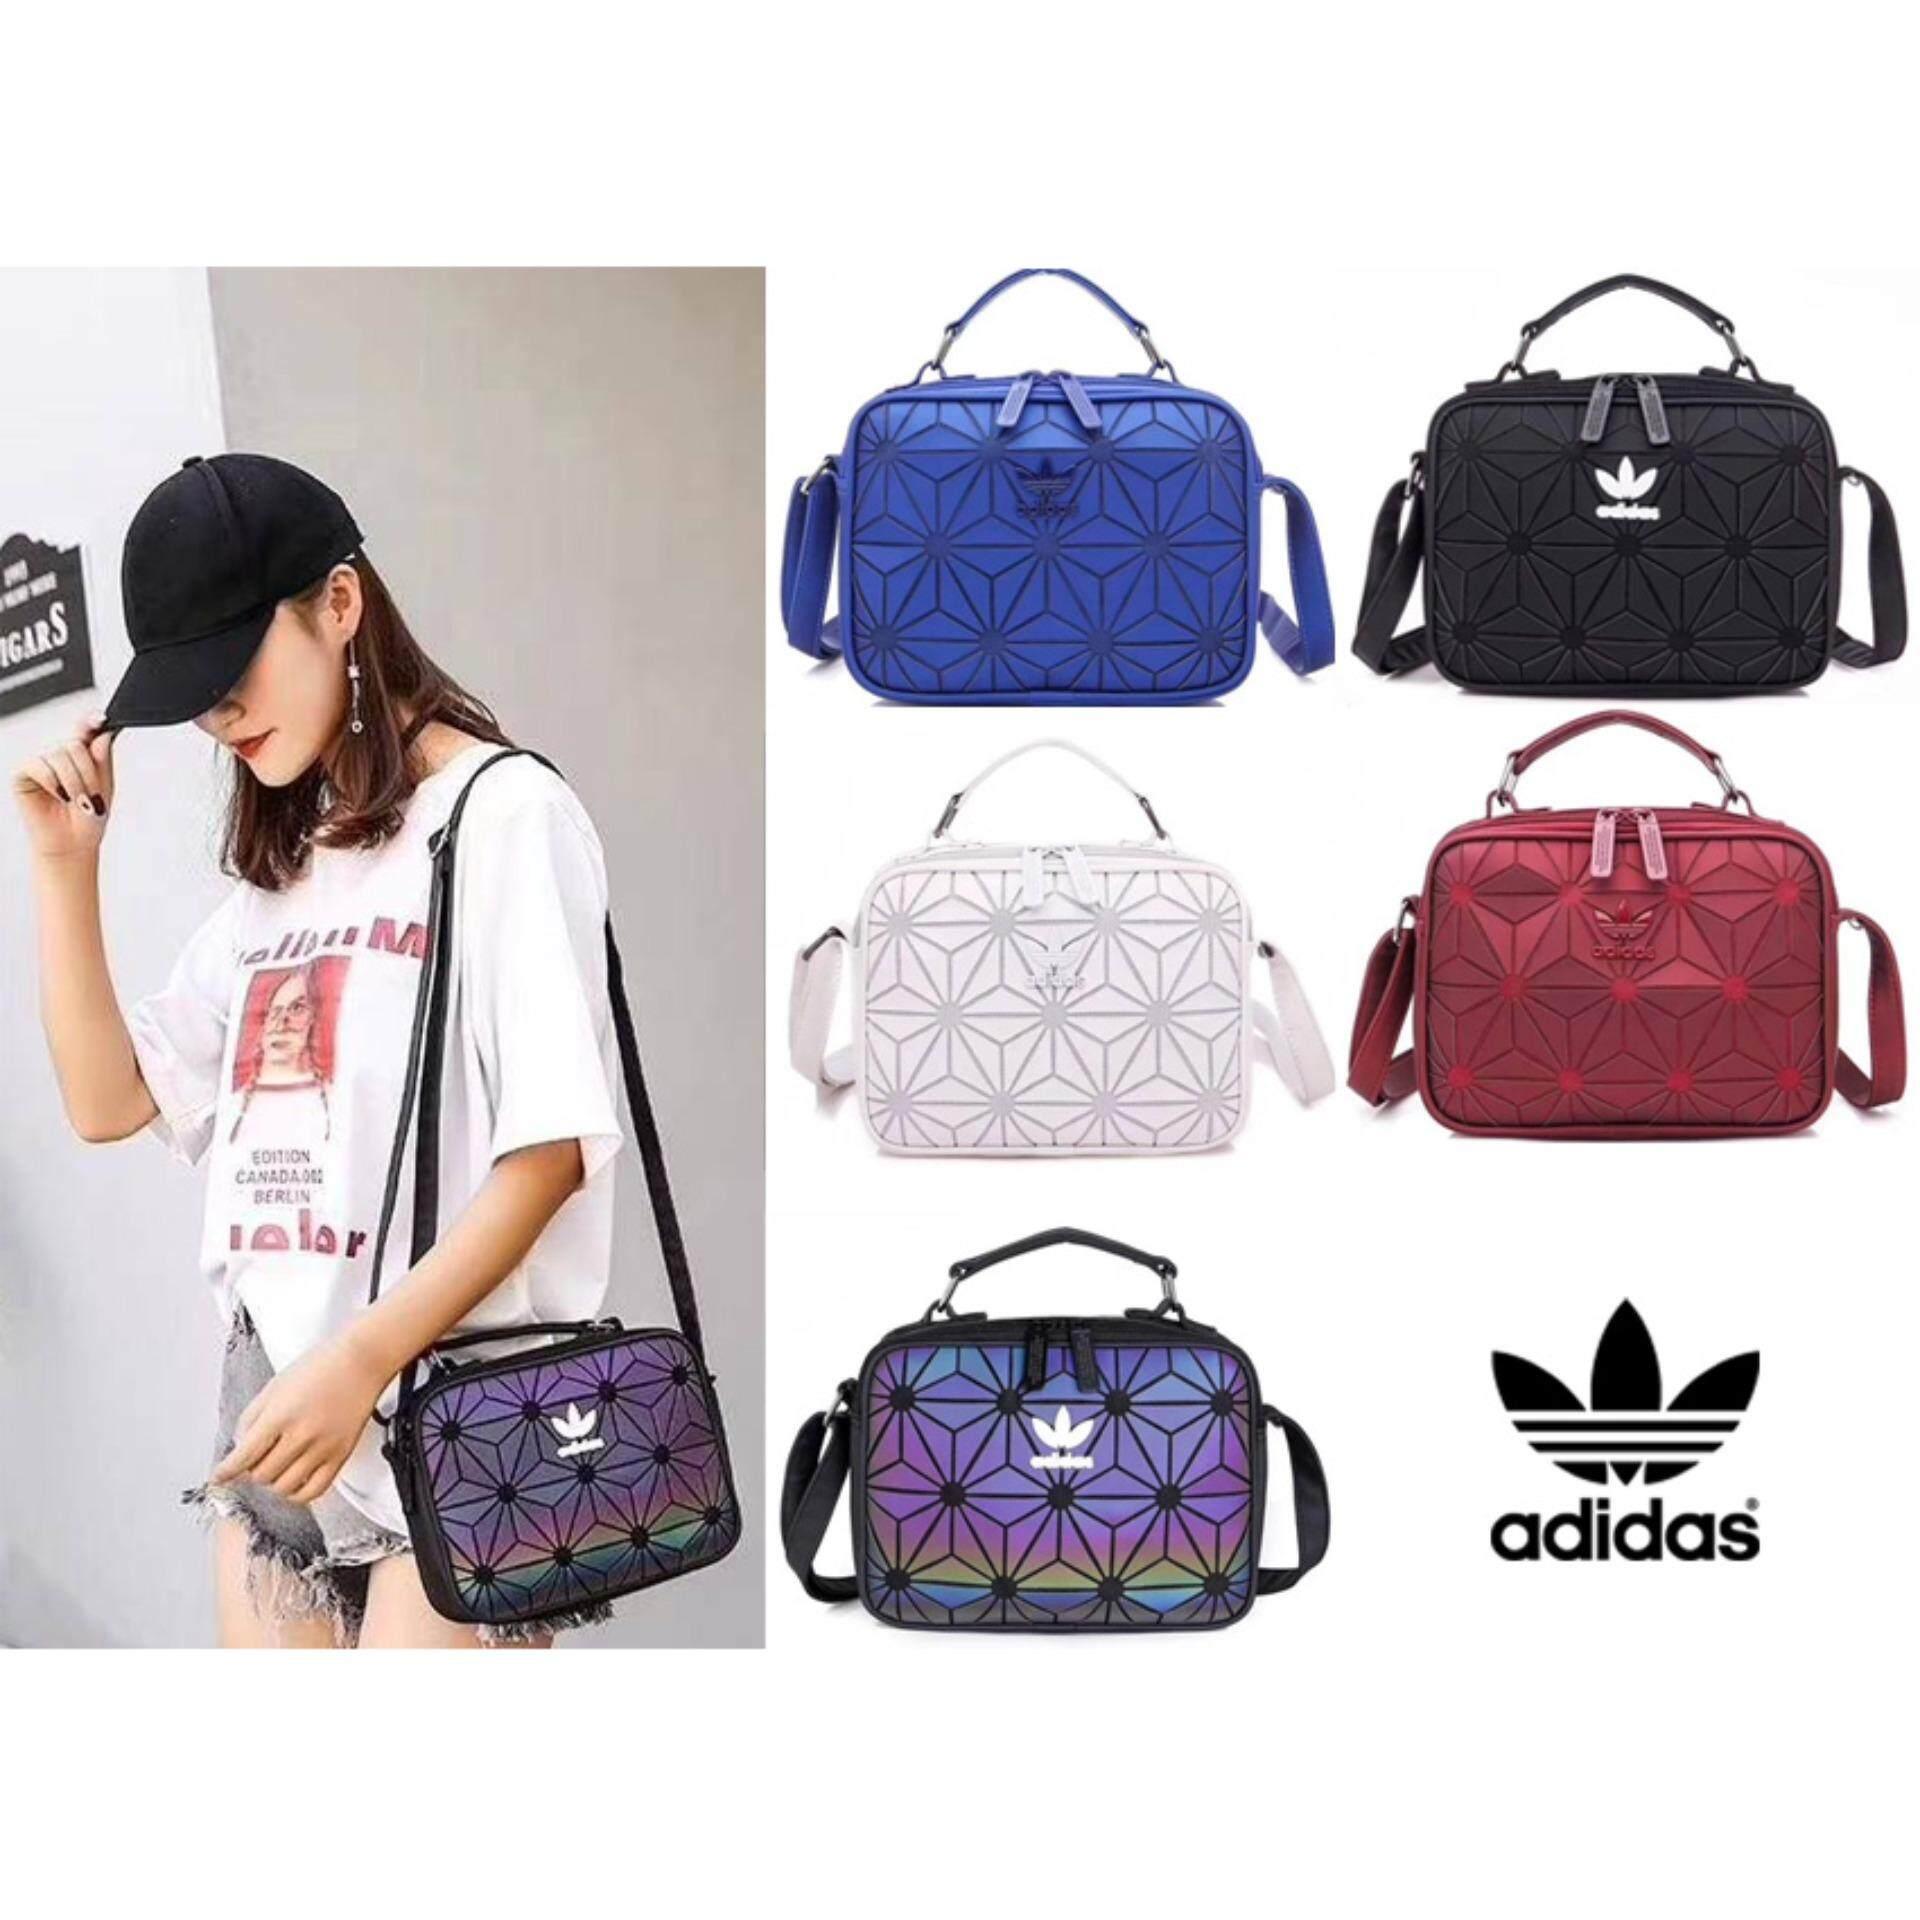 6ecac1c9e804 ขาย Adidas Bags - ซื้อ Bags พร้อมส่วนลด ดีลราคาถูก